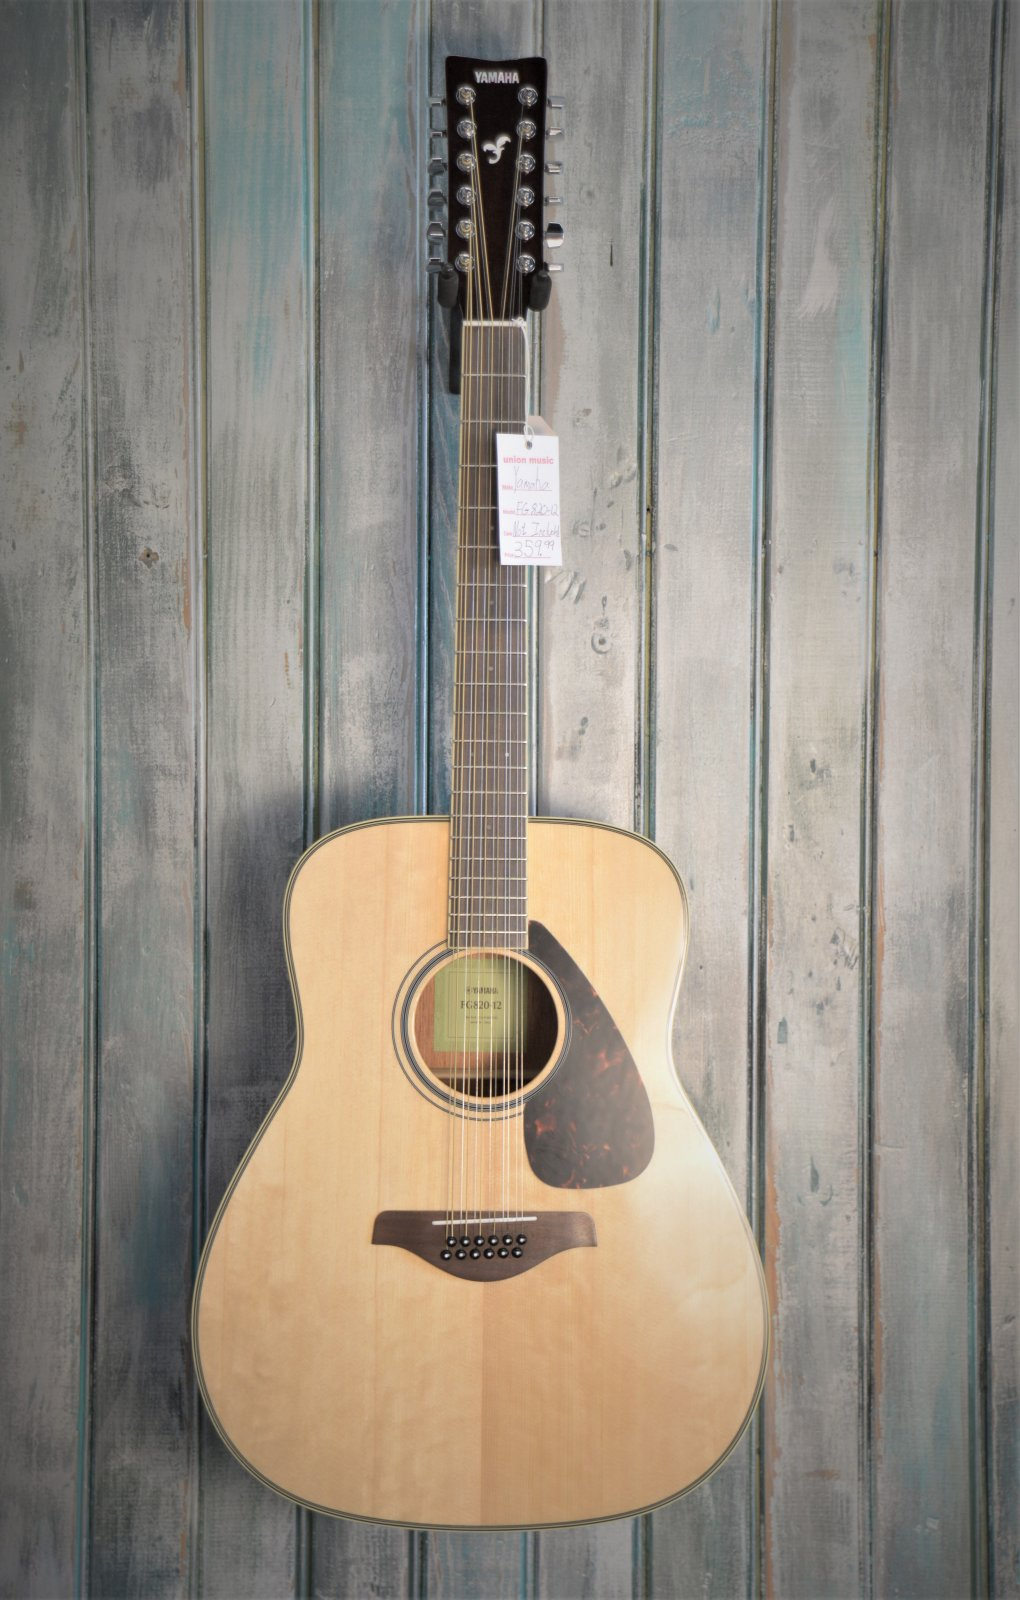 Yamaha FG820-12 12-string Dreadnaught